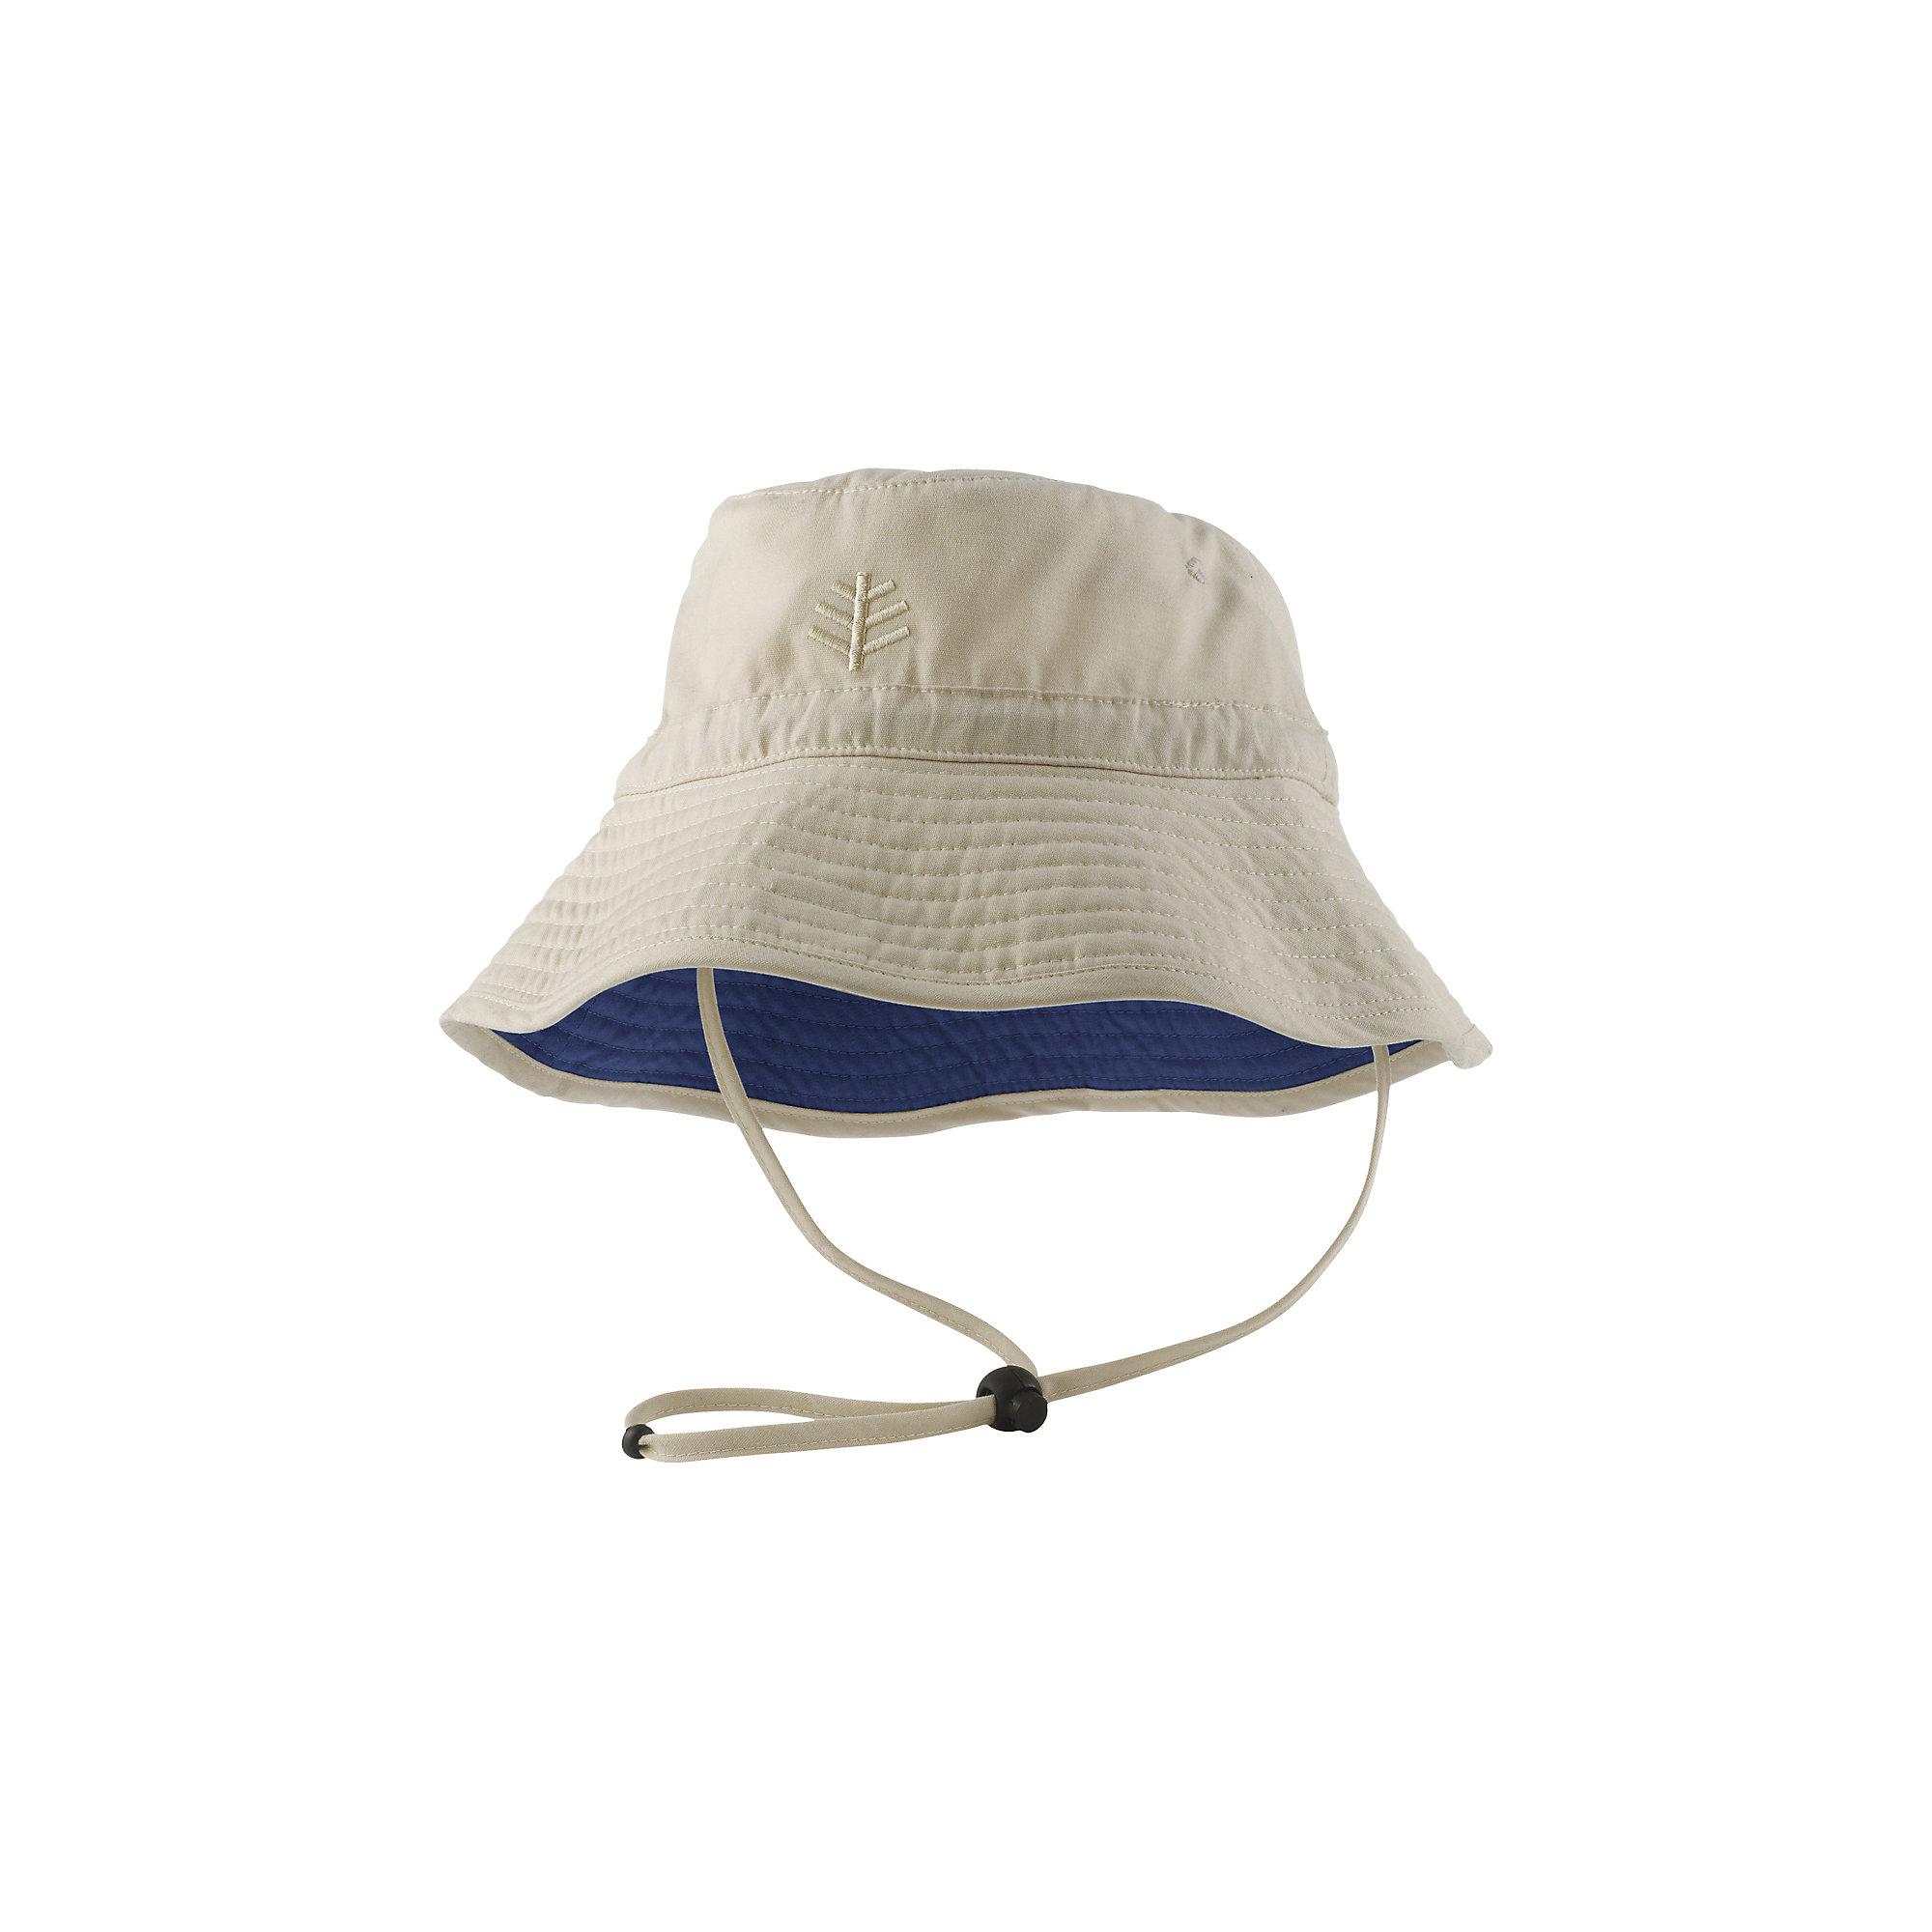 Coolibar upf 50 toddler chin strap hat ebay for Toddler fishing hat